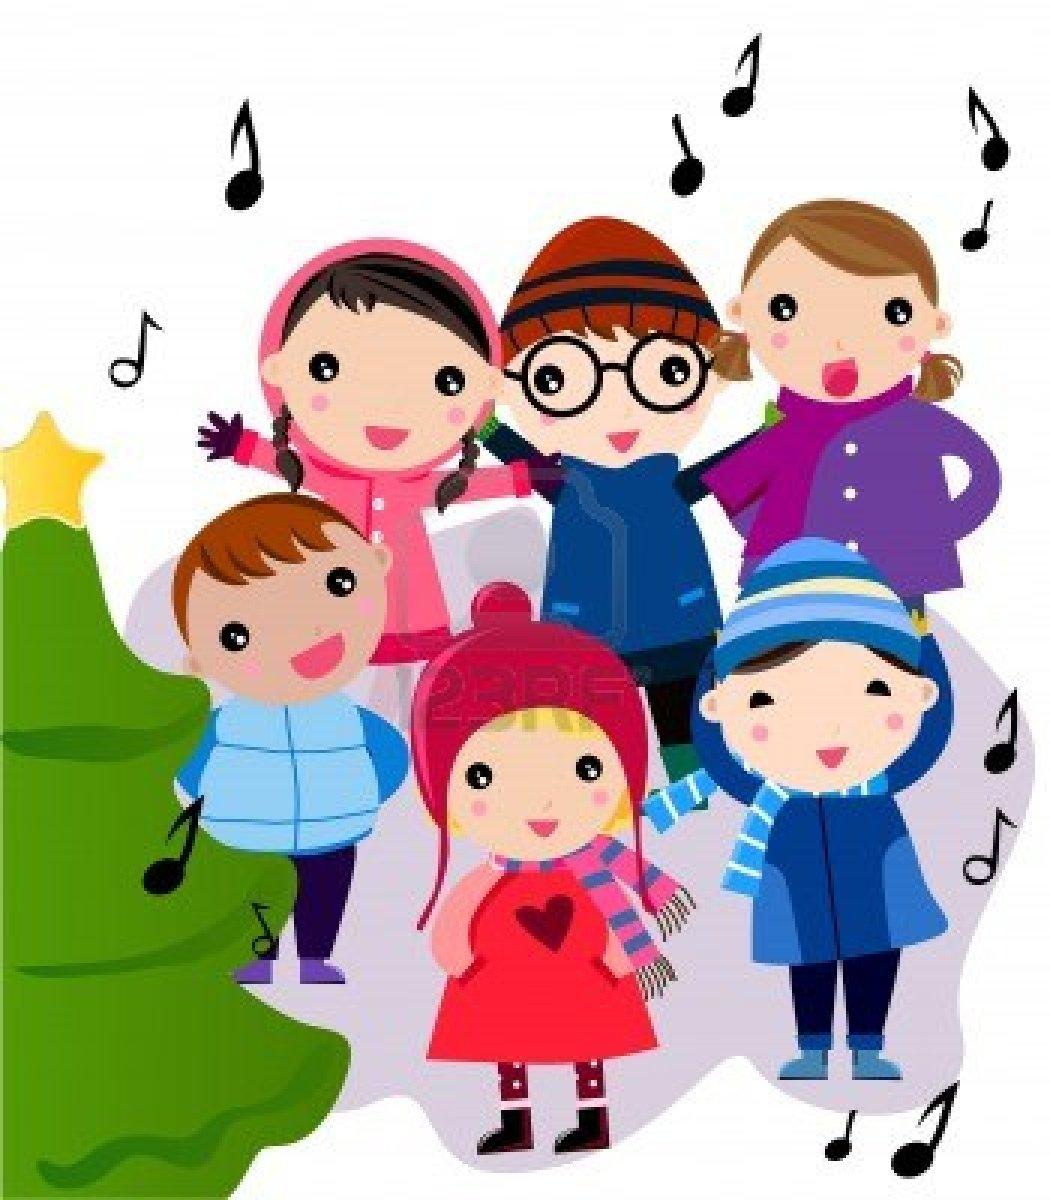 Free Sunday School Christmas Concert Singing Clipart.